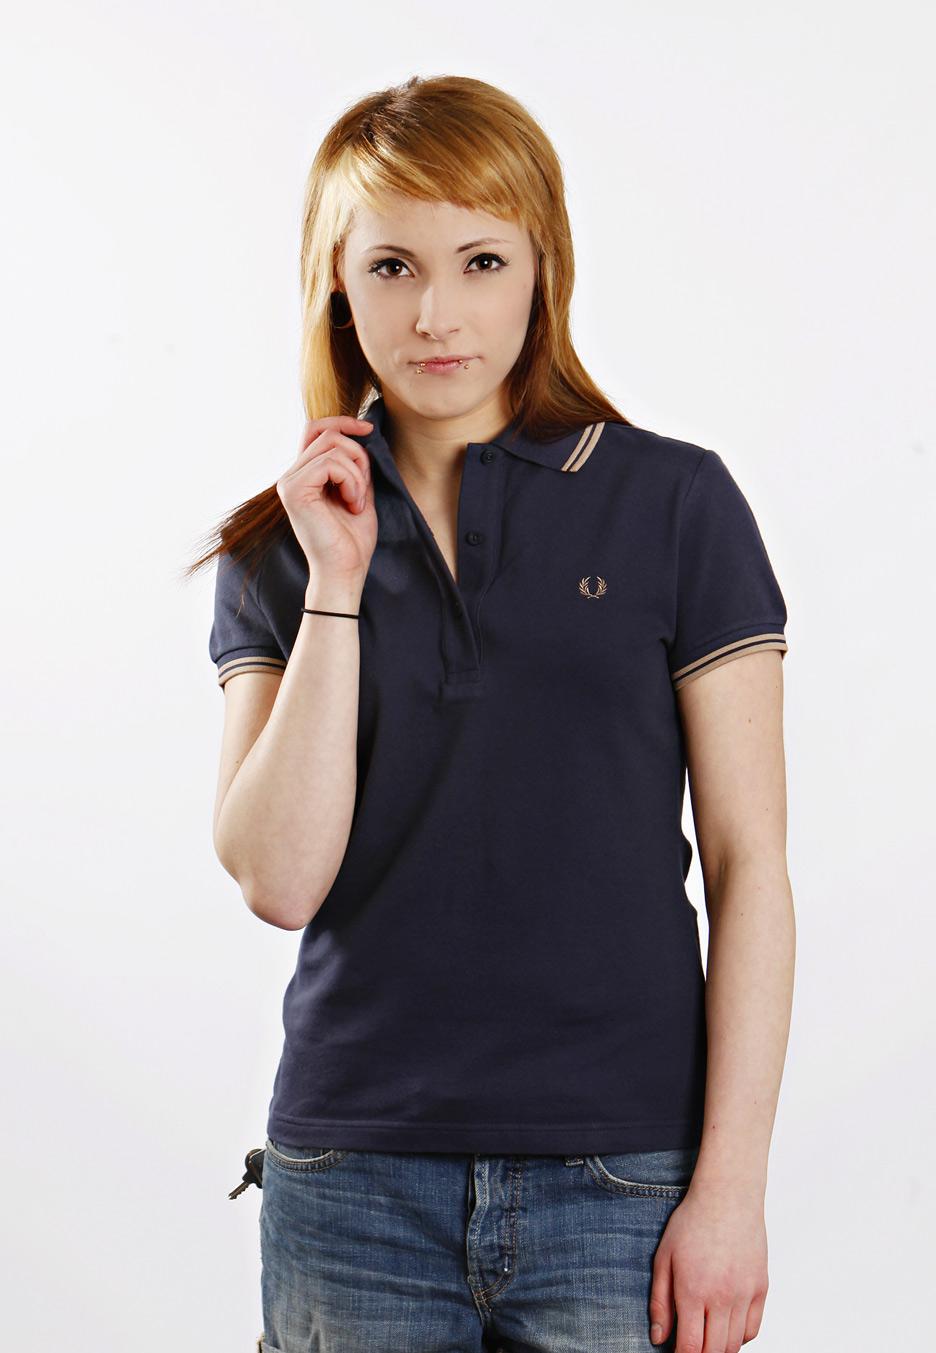 Are Black Shirts Fashionable